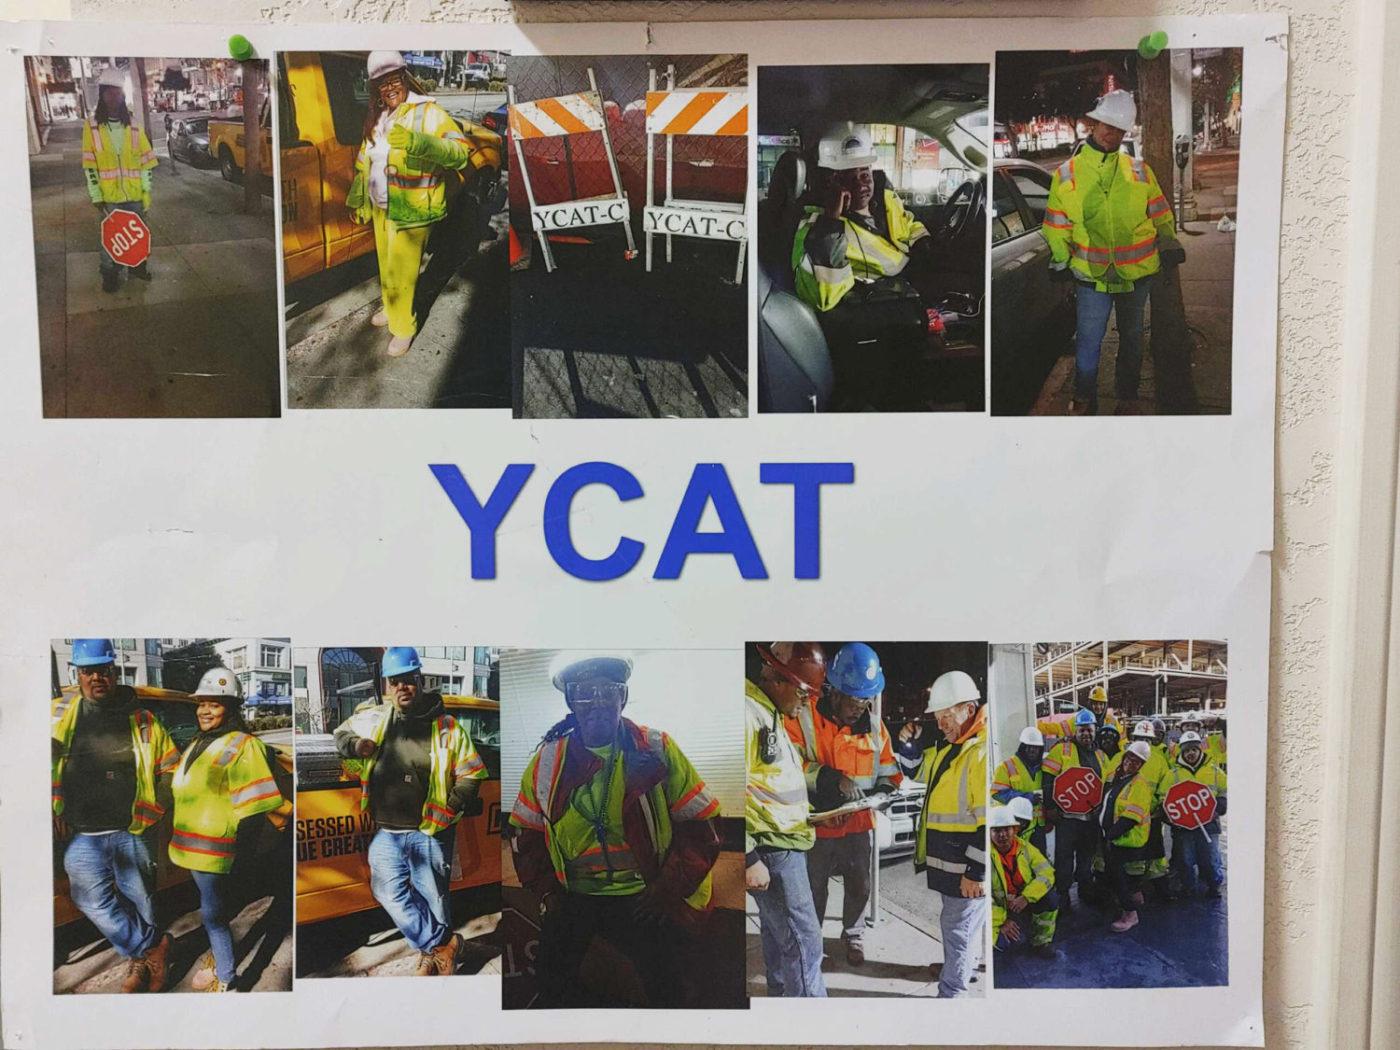 YCAT-Yolanda-Jones-work-photo-composite-1400x1050, Yolanda Jones: Celebrating a Black Queen and a BOSS!, Culture Currents